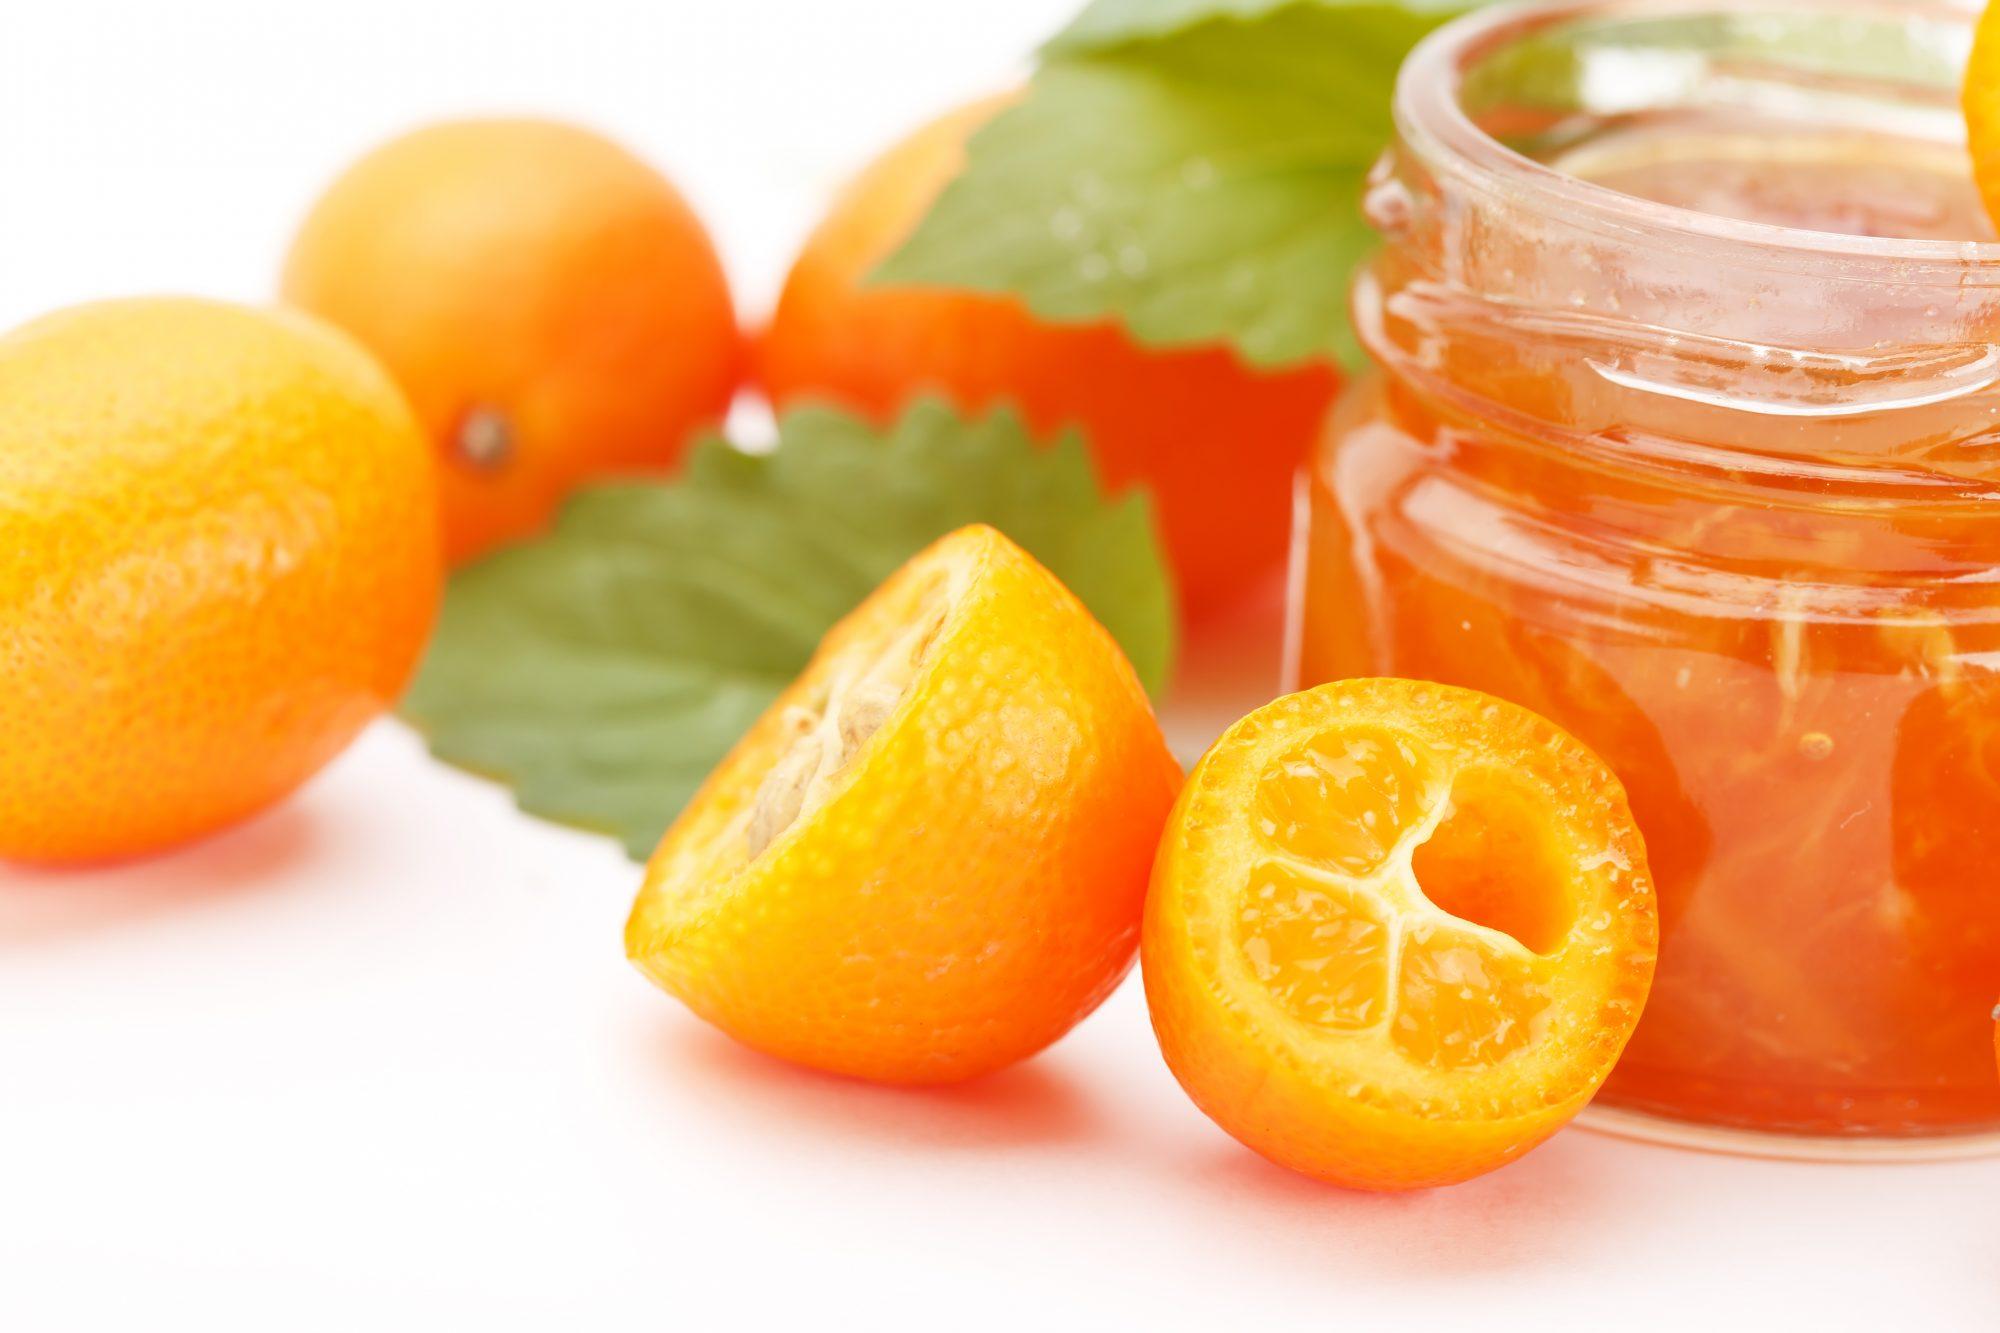 Kumquat Marmalade Getty 11/21/19